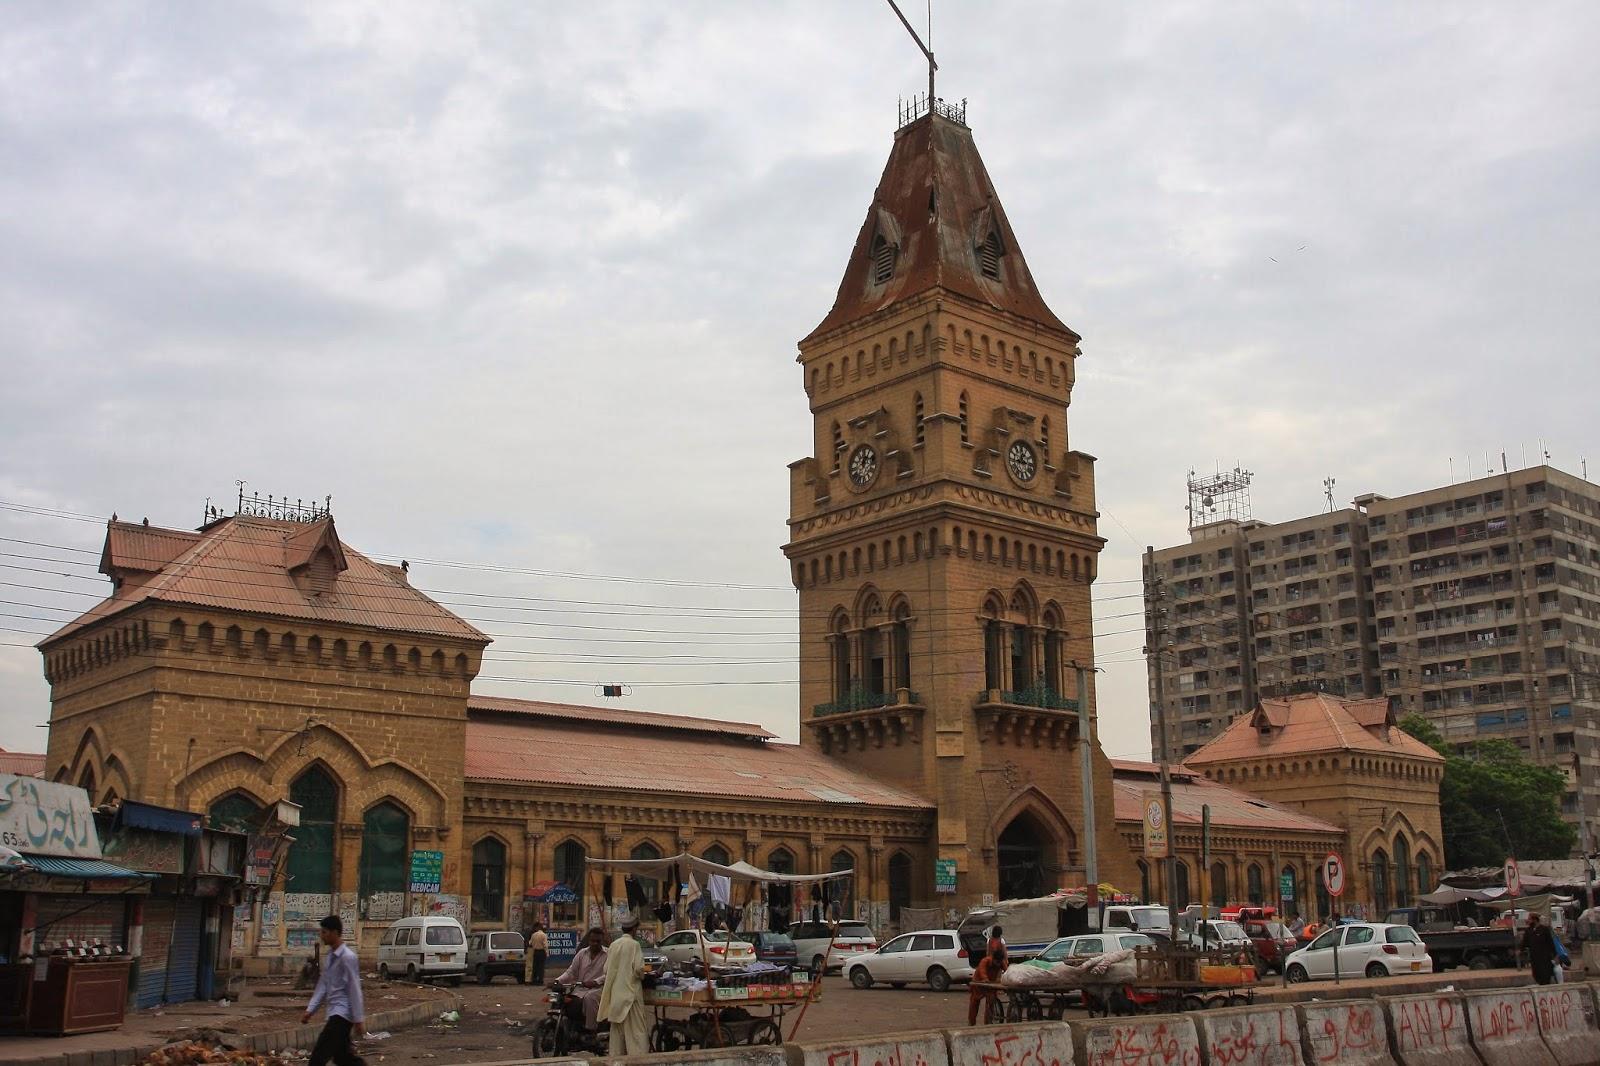 empress market, Things to do in Karachi